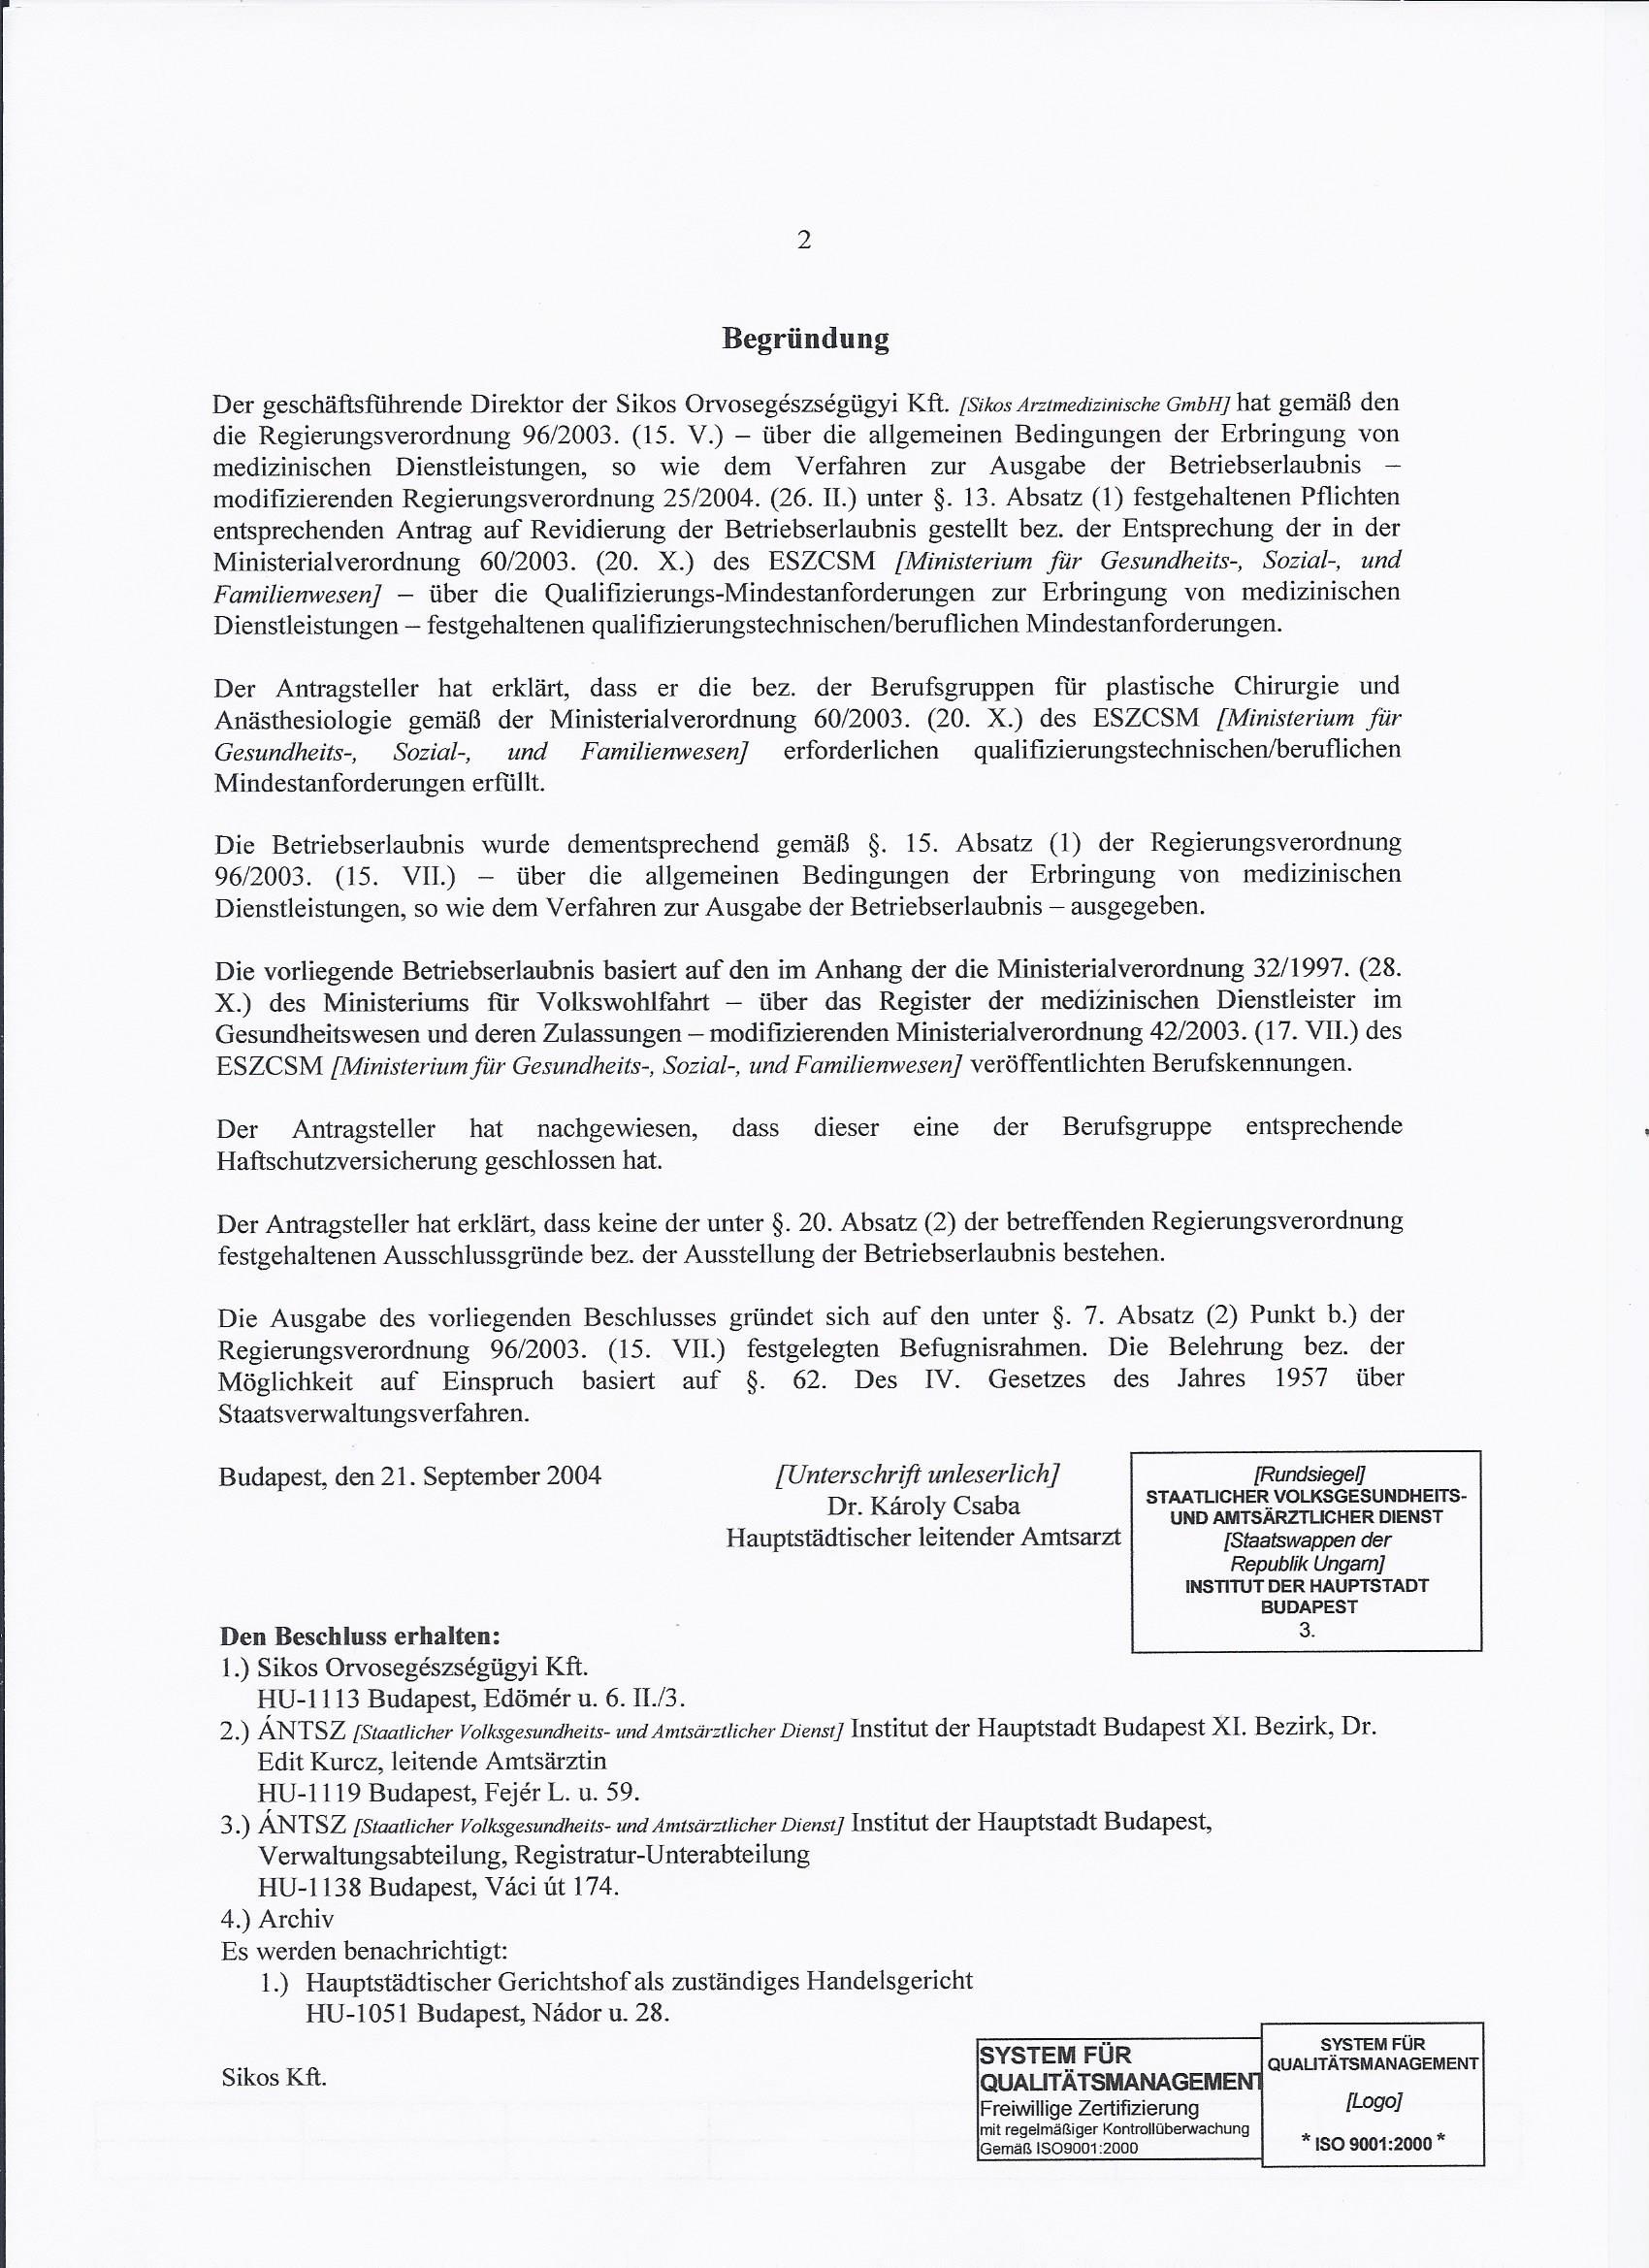 Betriebserlaubnis Sikos Clinic